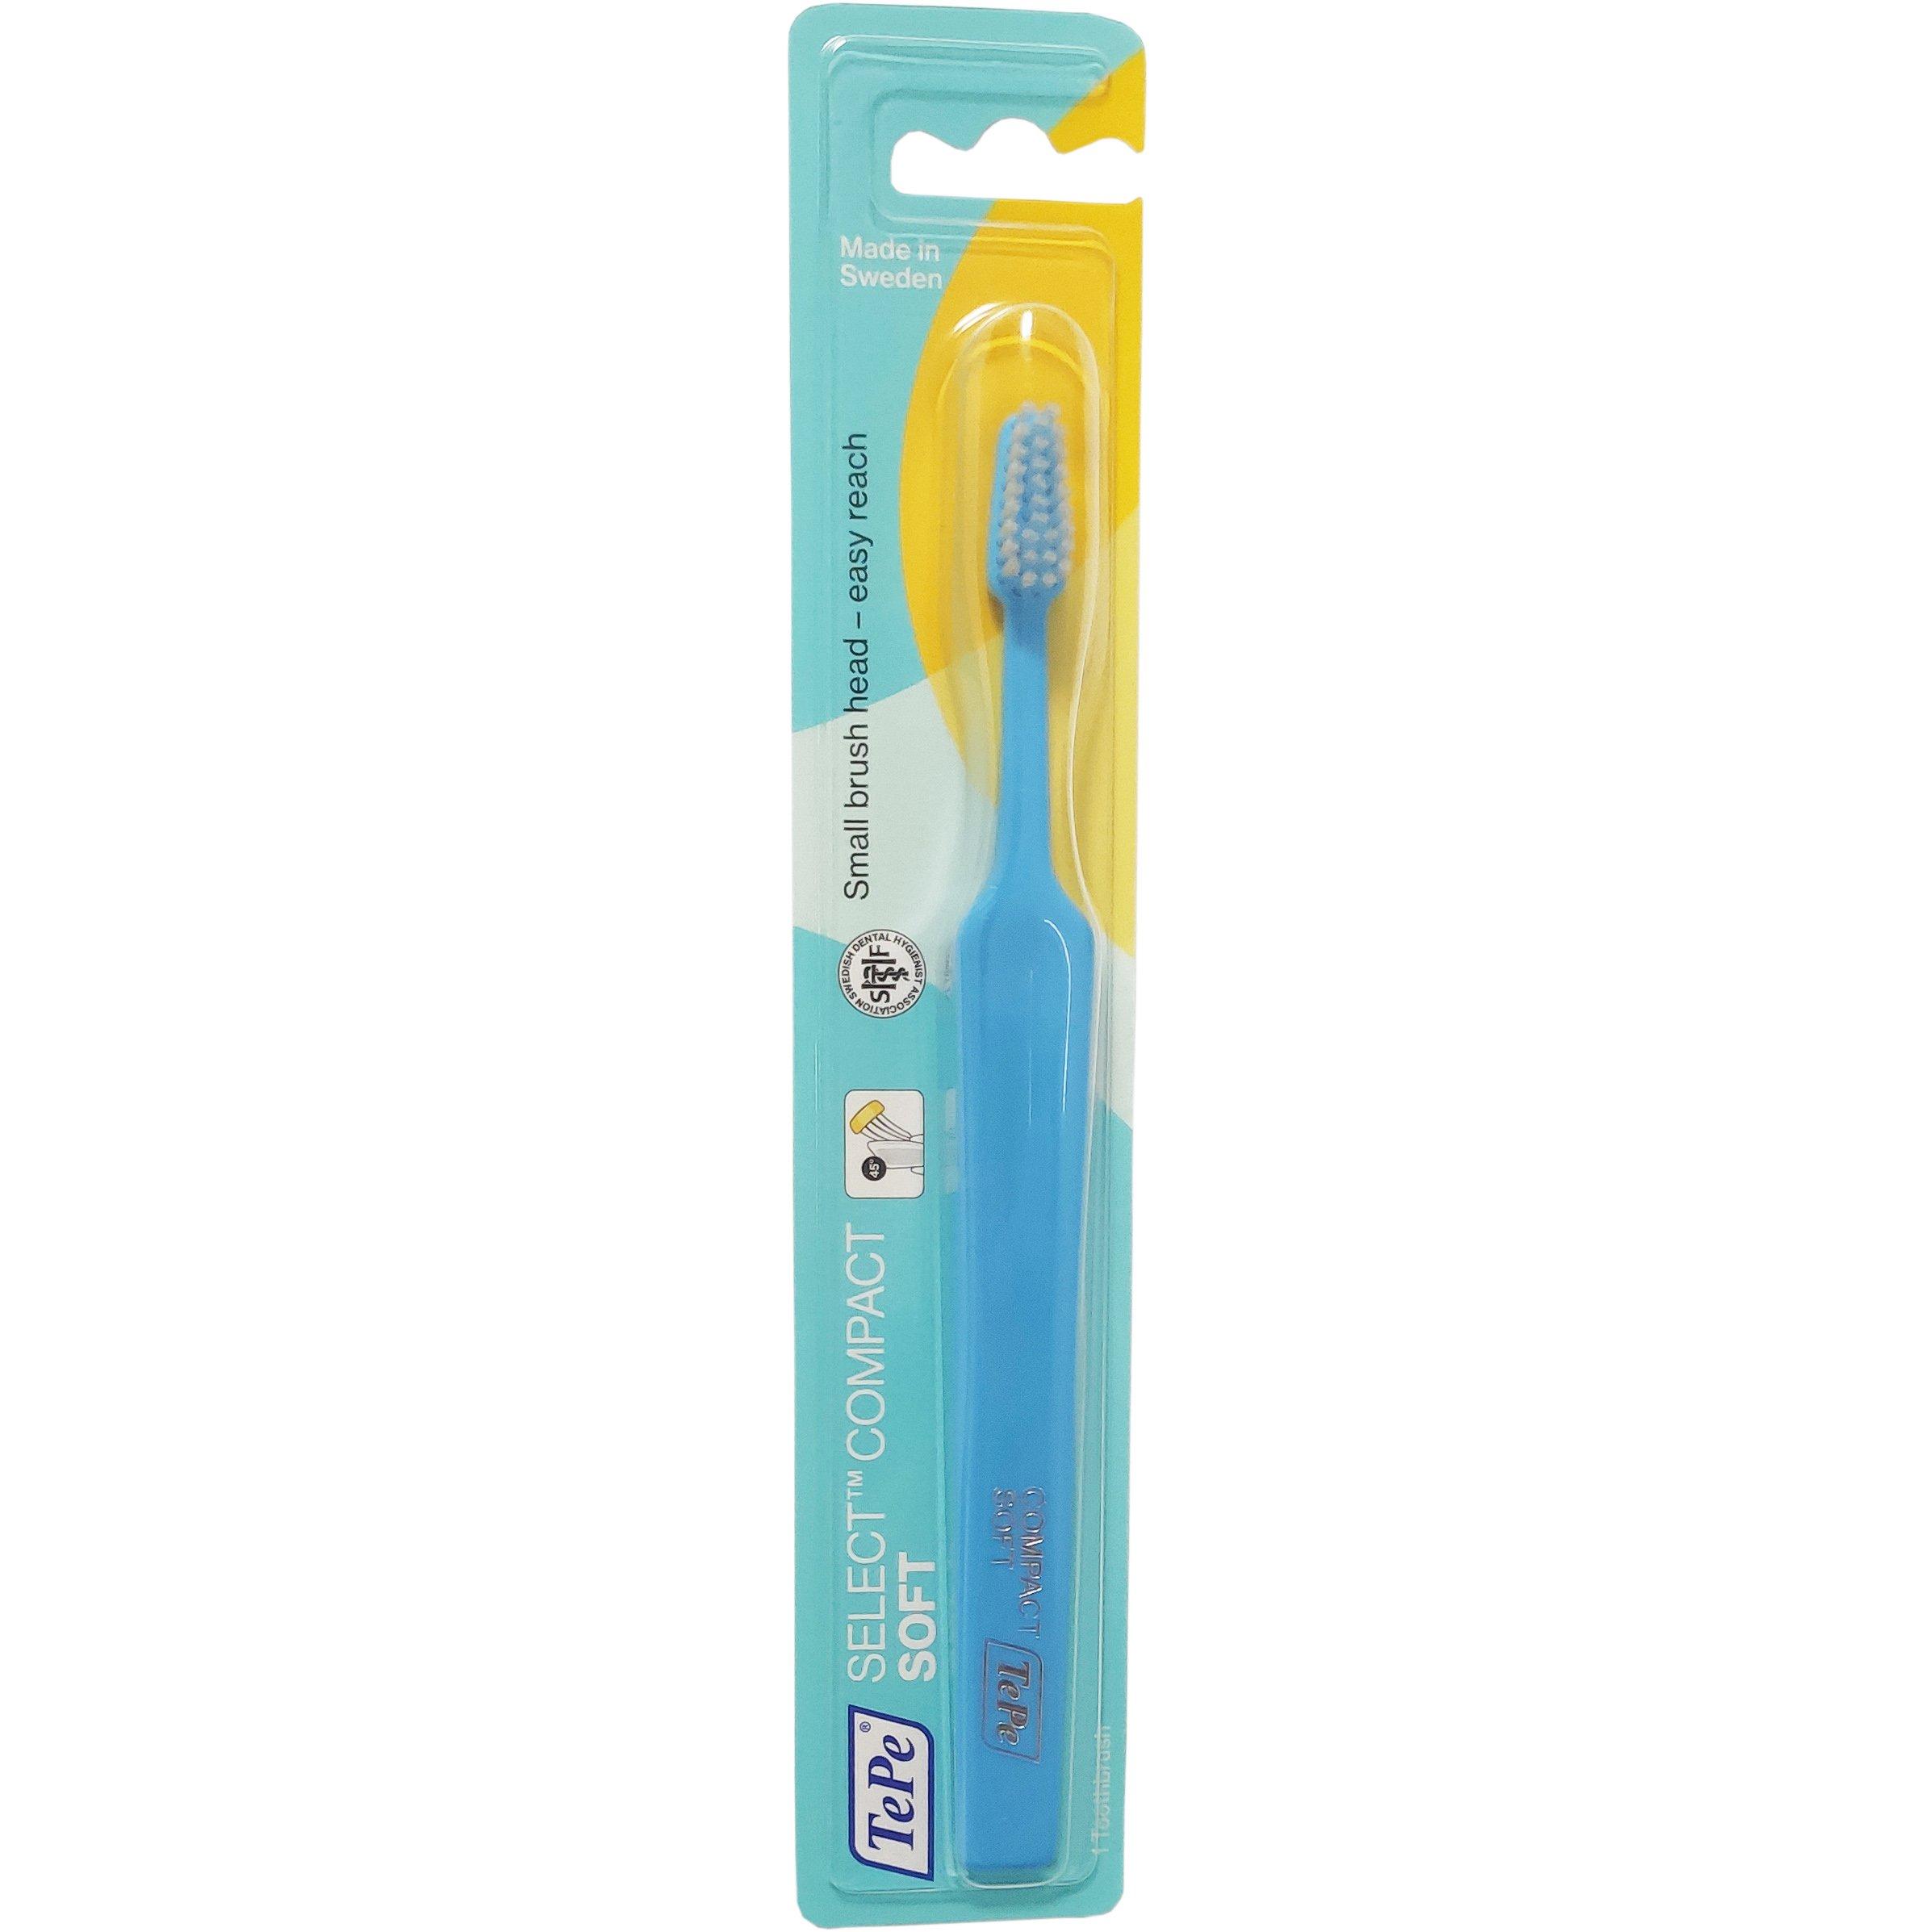 TePe Select Compact Soft Οδοντόβουρτσα Μαλακή για Αποτελεσματικό Καθαρισμό 1 Τεμάχιο – γαλάζιο